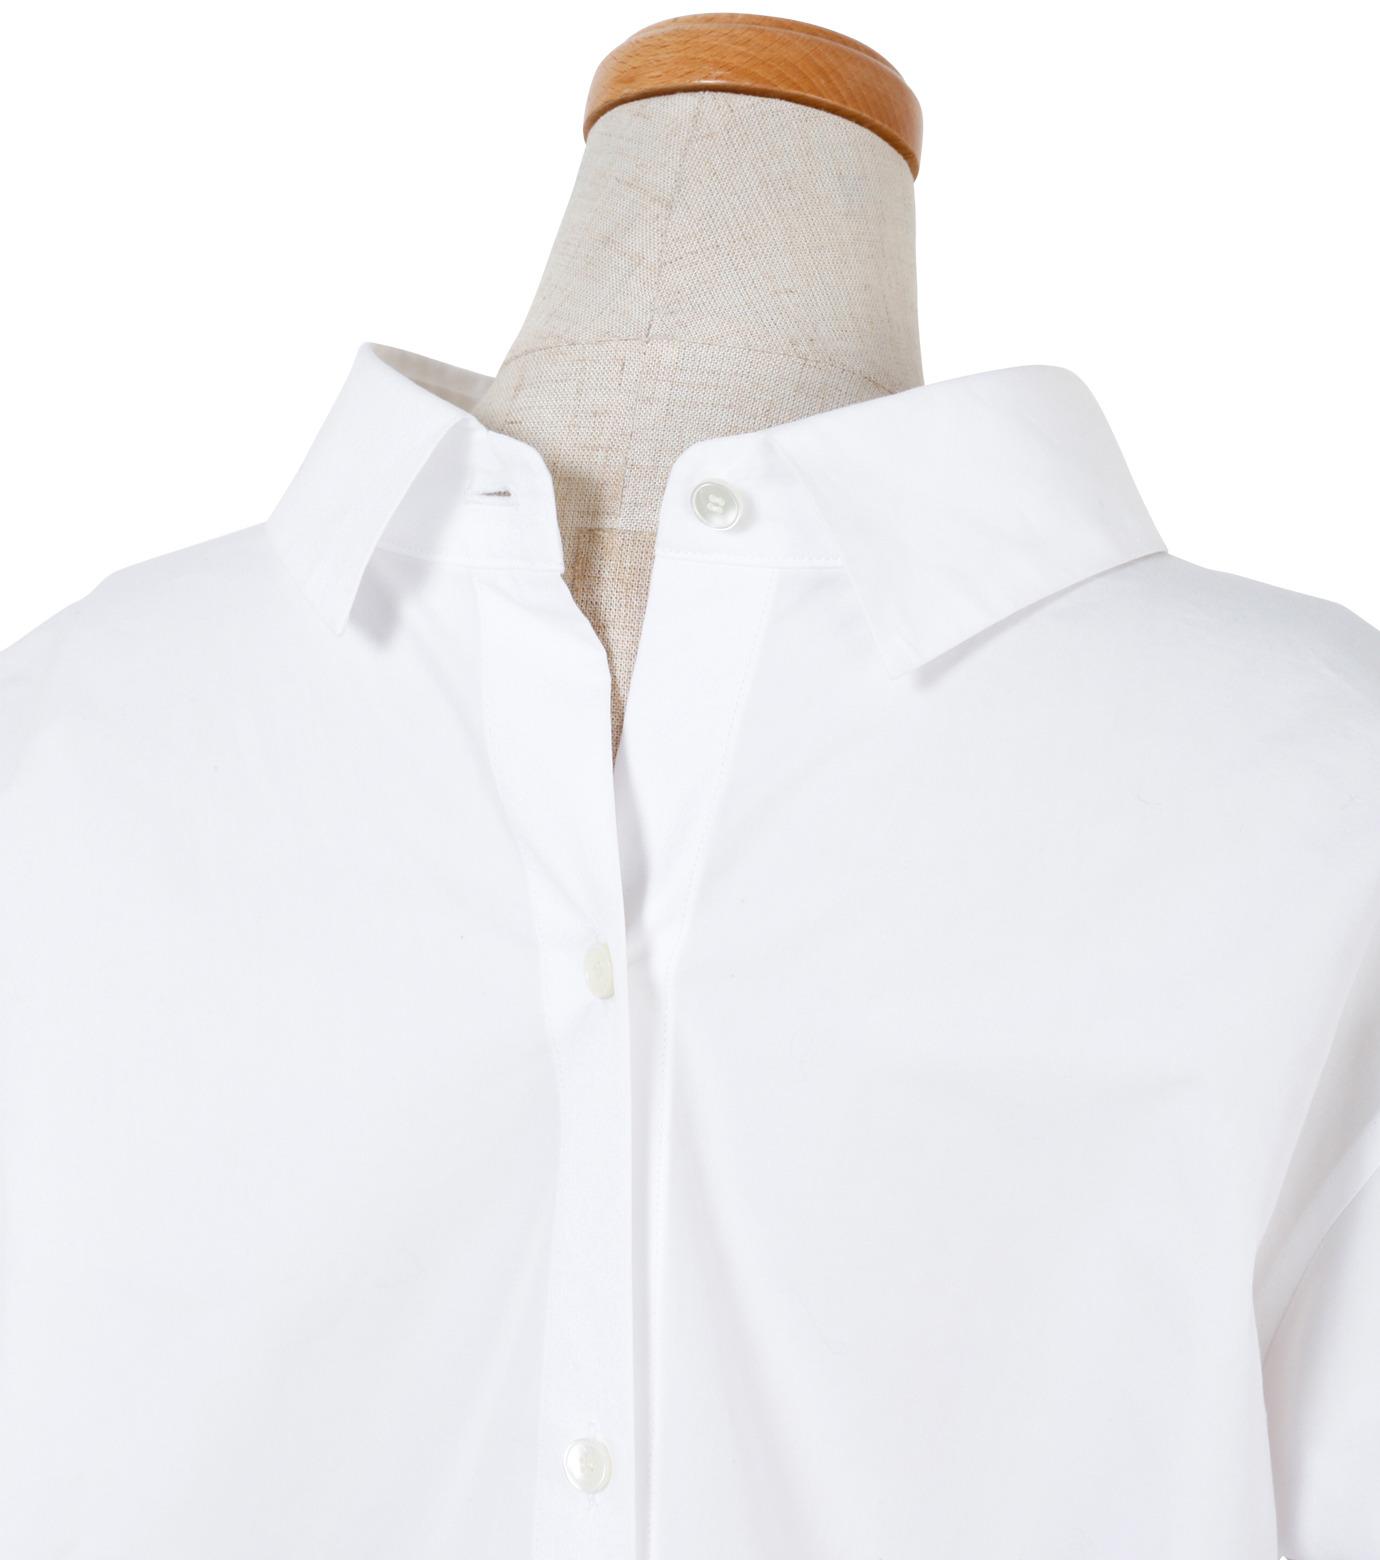 IRENE(アイレネ)のバックワーズシャツ-WHITE(シャツ/shirt)-19S83009 拡大詳細画像5